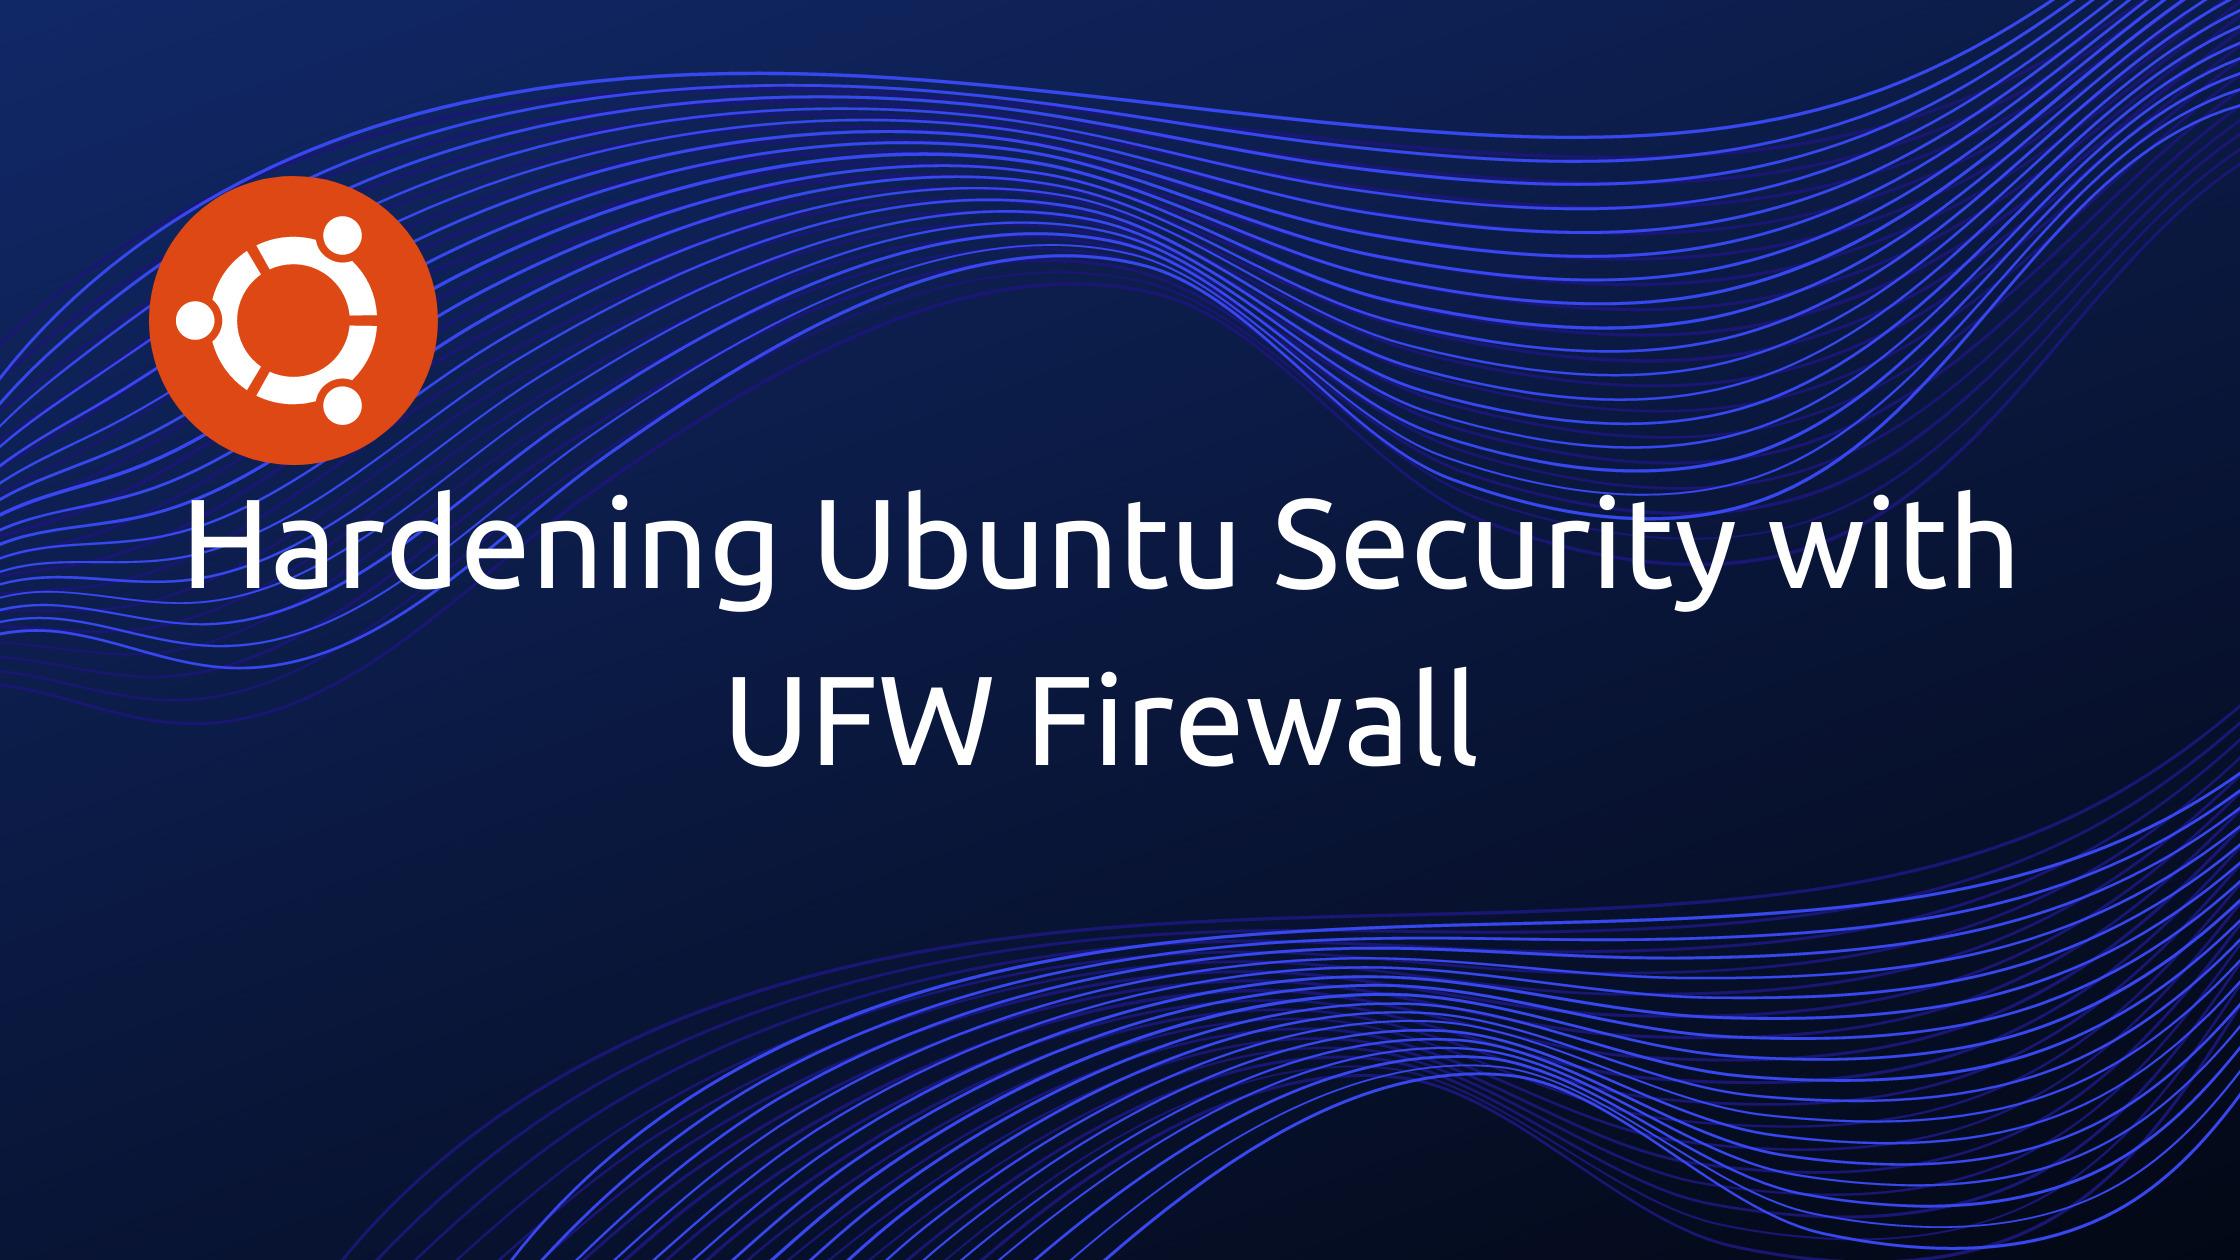 Hardening Ubuntu Security with UFW Firewall